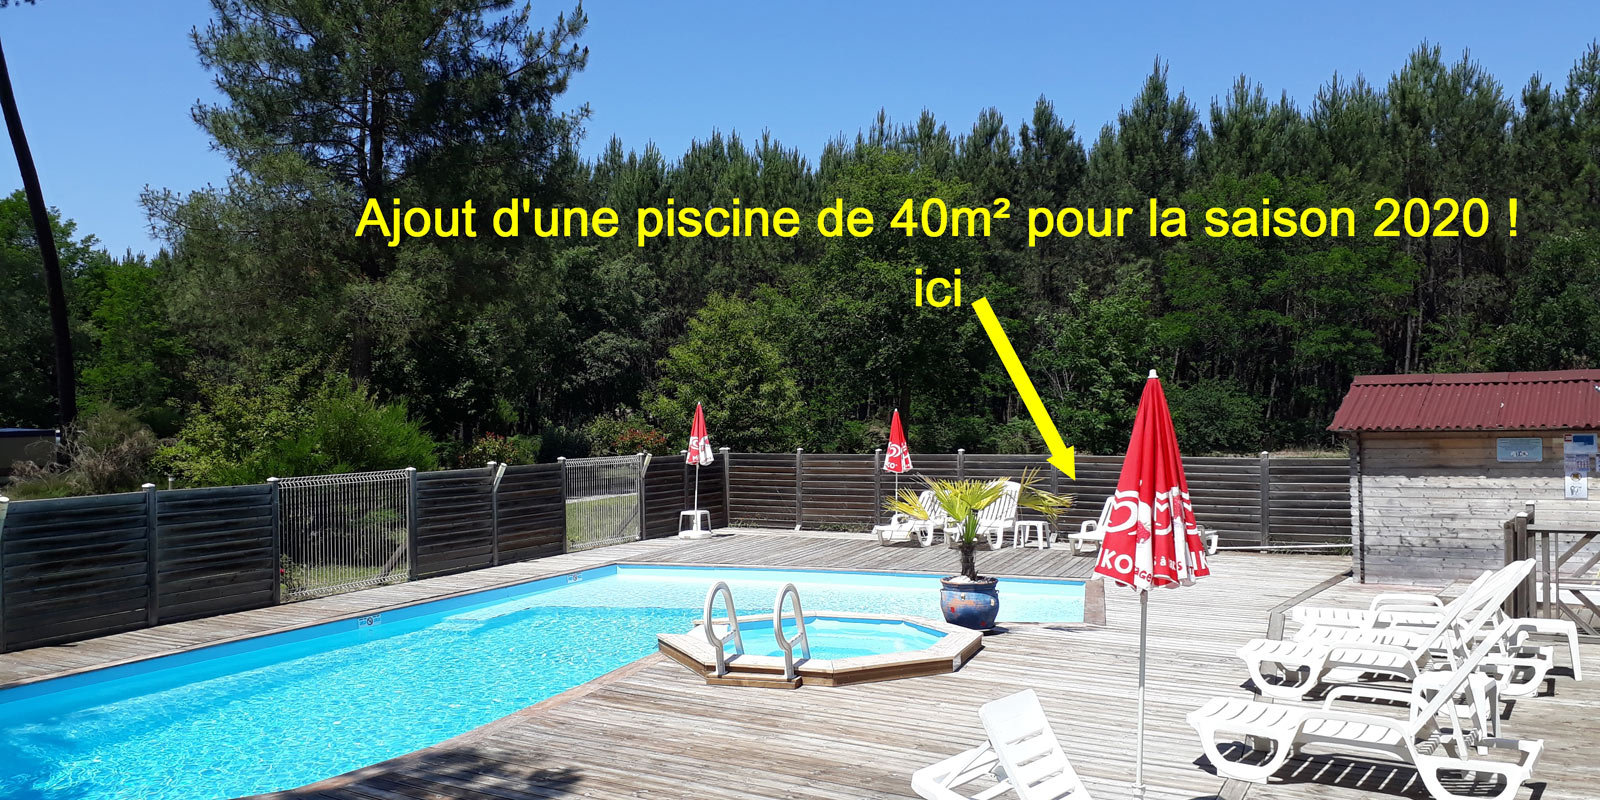 Camping Sud Gironde Foret Des Landes - Bordeaux à Camping Landes Avec Piscine